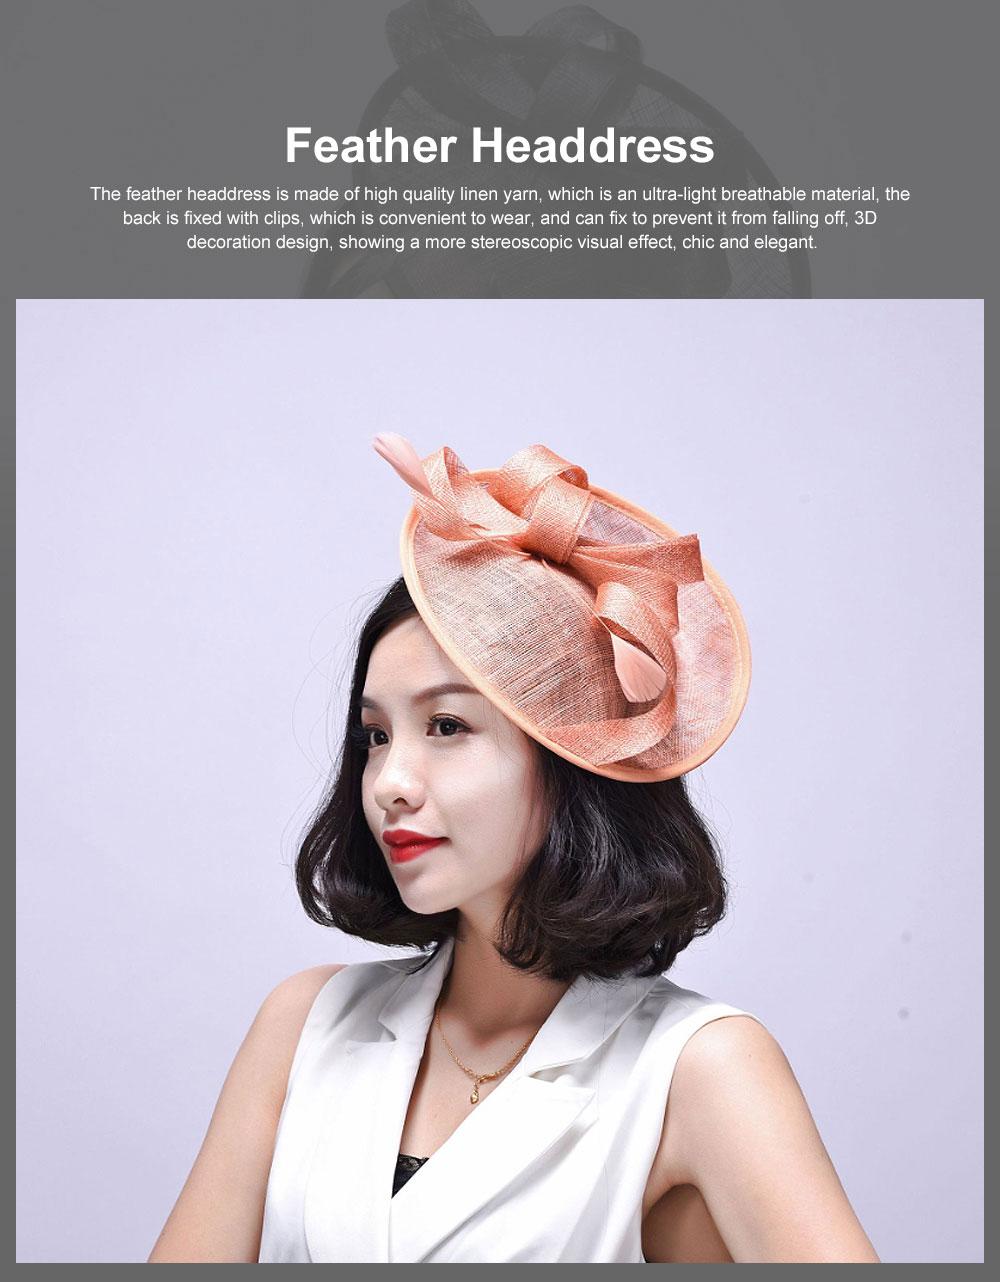 Women Headdress, Horse Riding Yarn Bowknot Feather Top Hat, Banquet Wedding Accessory Headwear 0